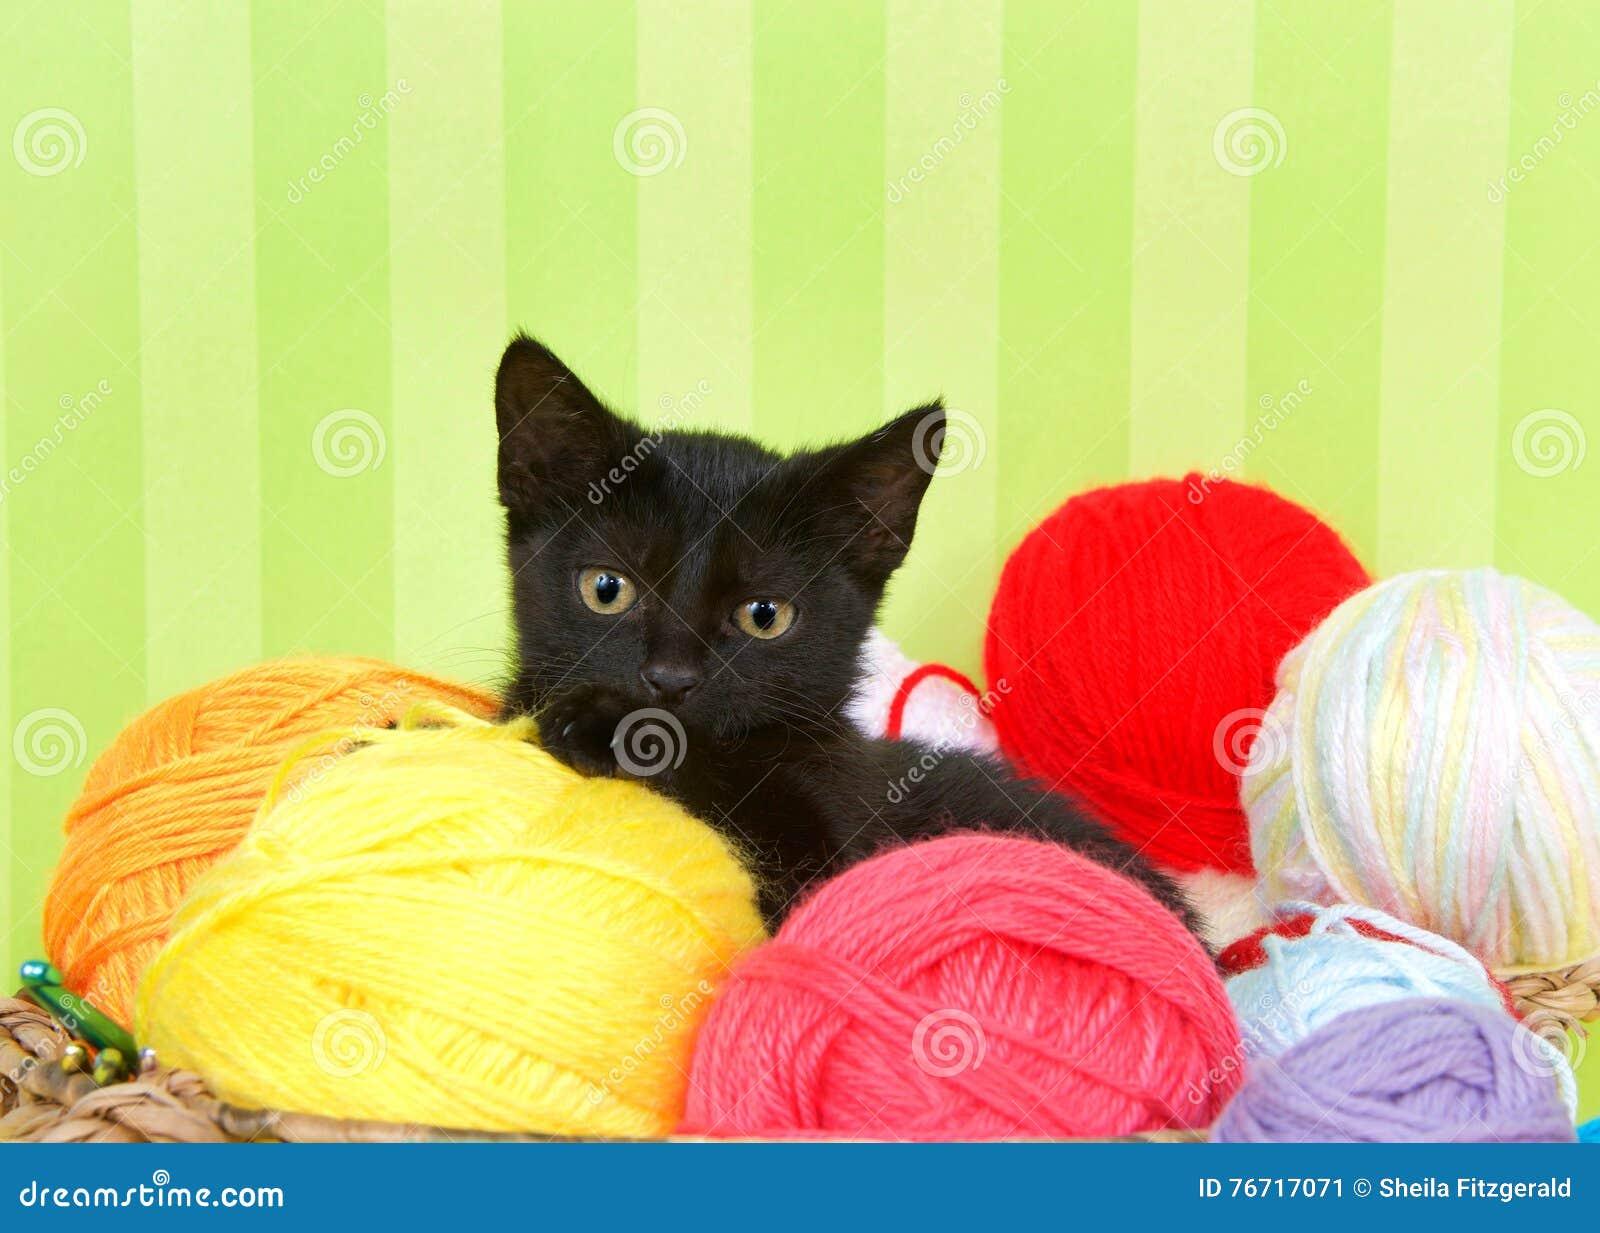 Fuzzy Black Background : Yarn fuzzy blue and purple stock photo cartoondealer